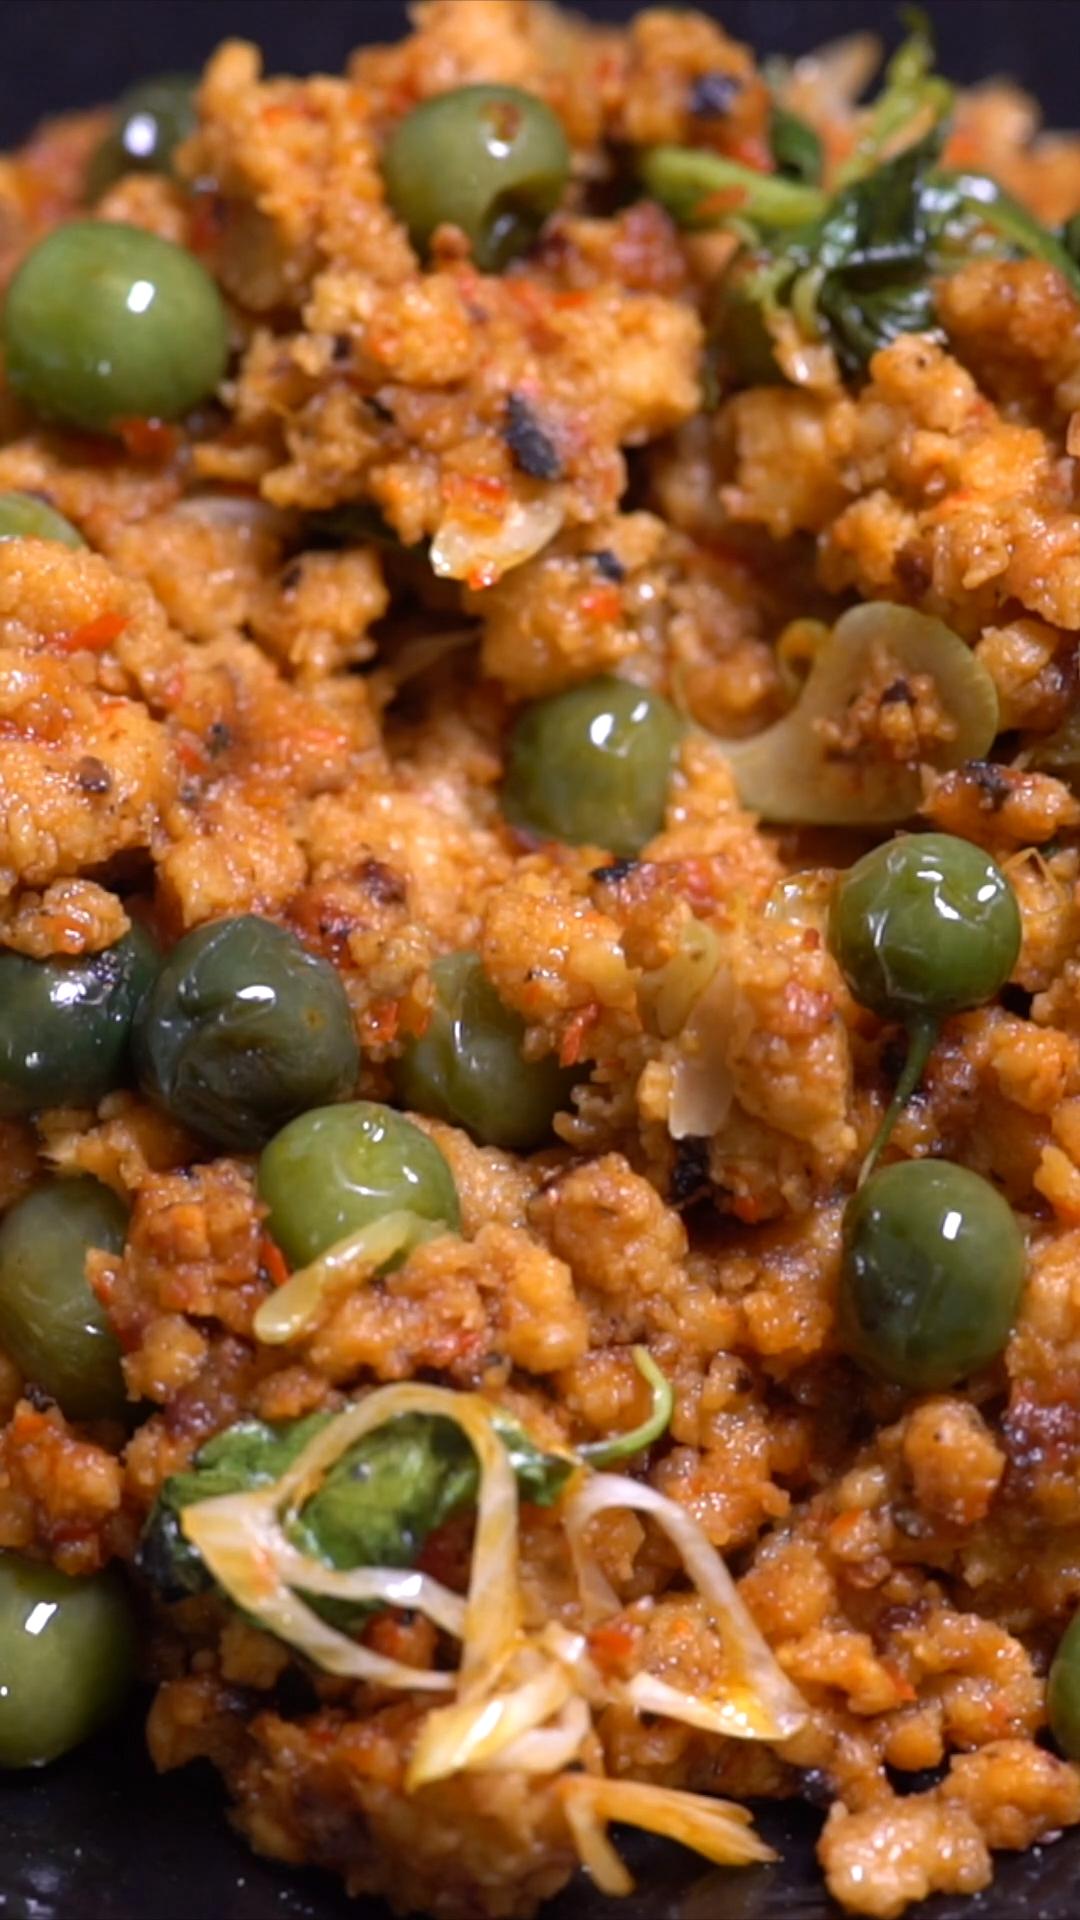 Video Video Ulukutek Leunca Oncom Resep Resep Resep Makanan Masakan Simpel Resep Masakan